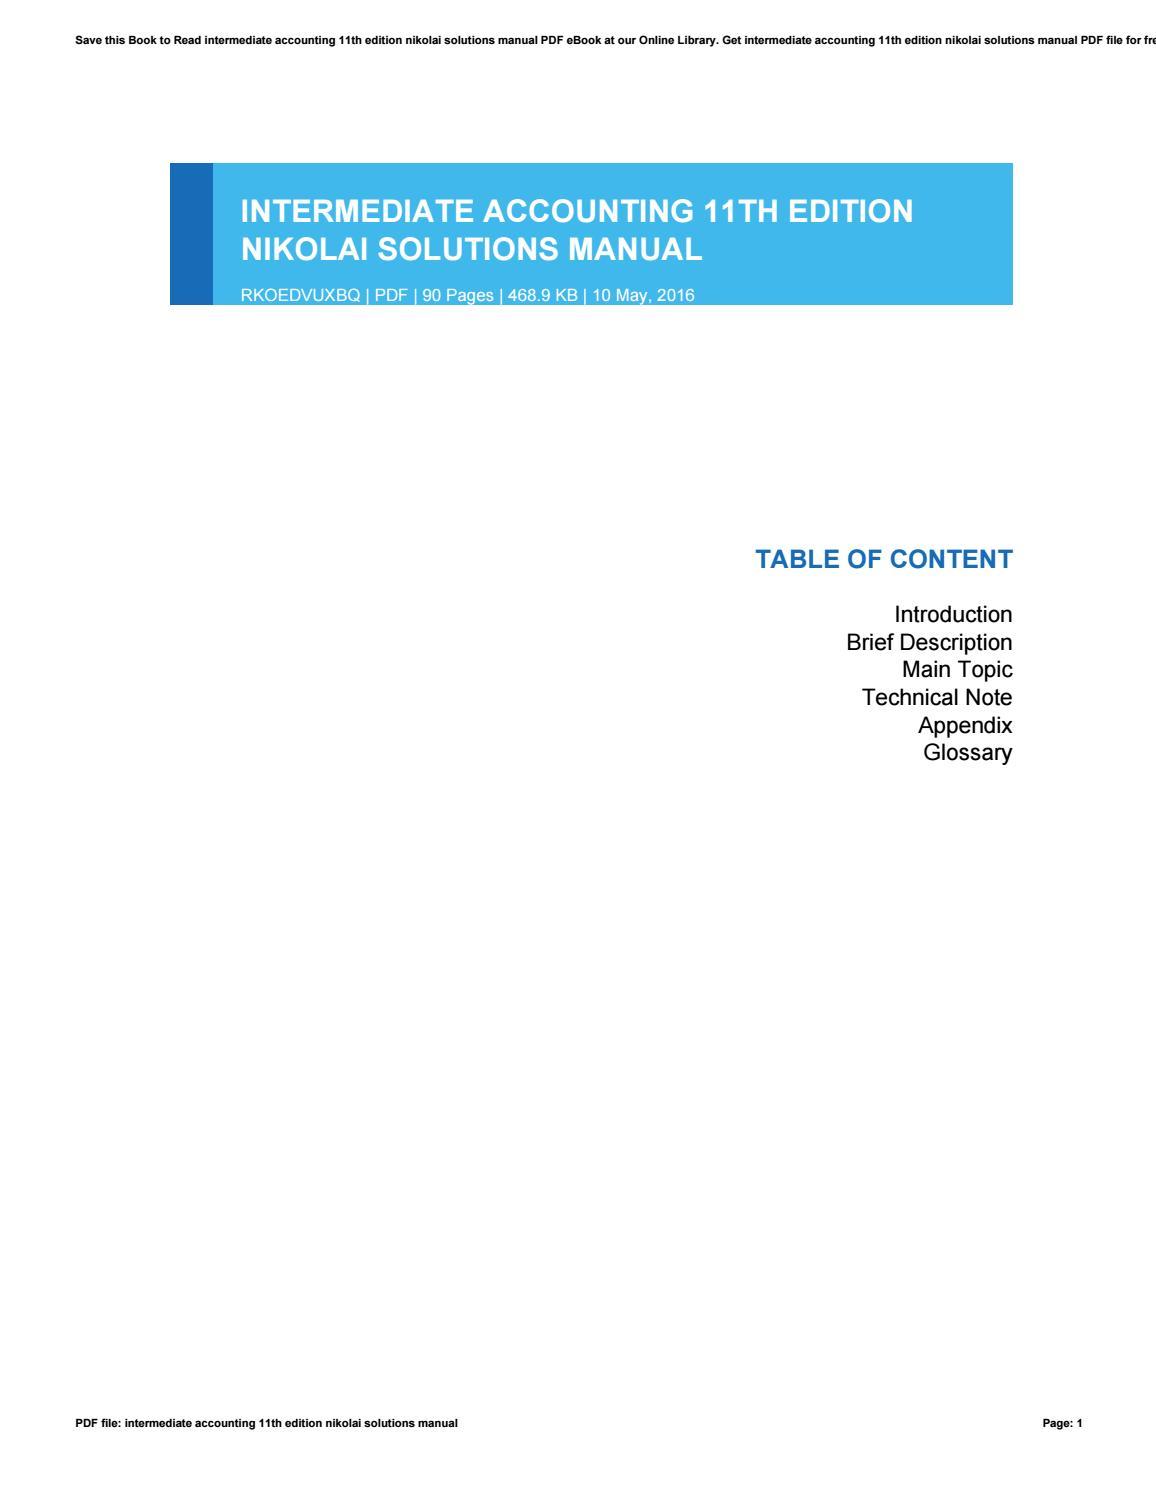 Intermediate accounting 11th edition nikolai solutions manual by Michael -  issuu